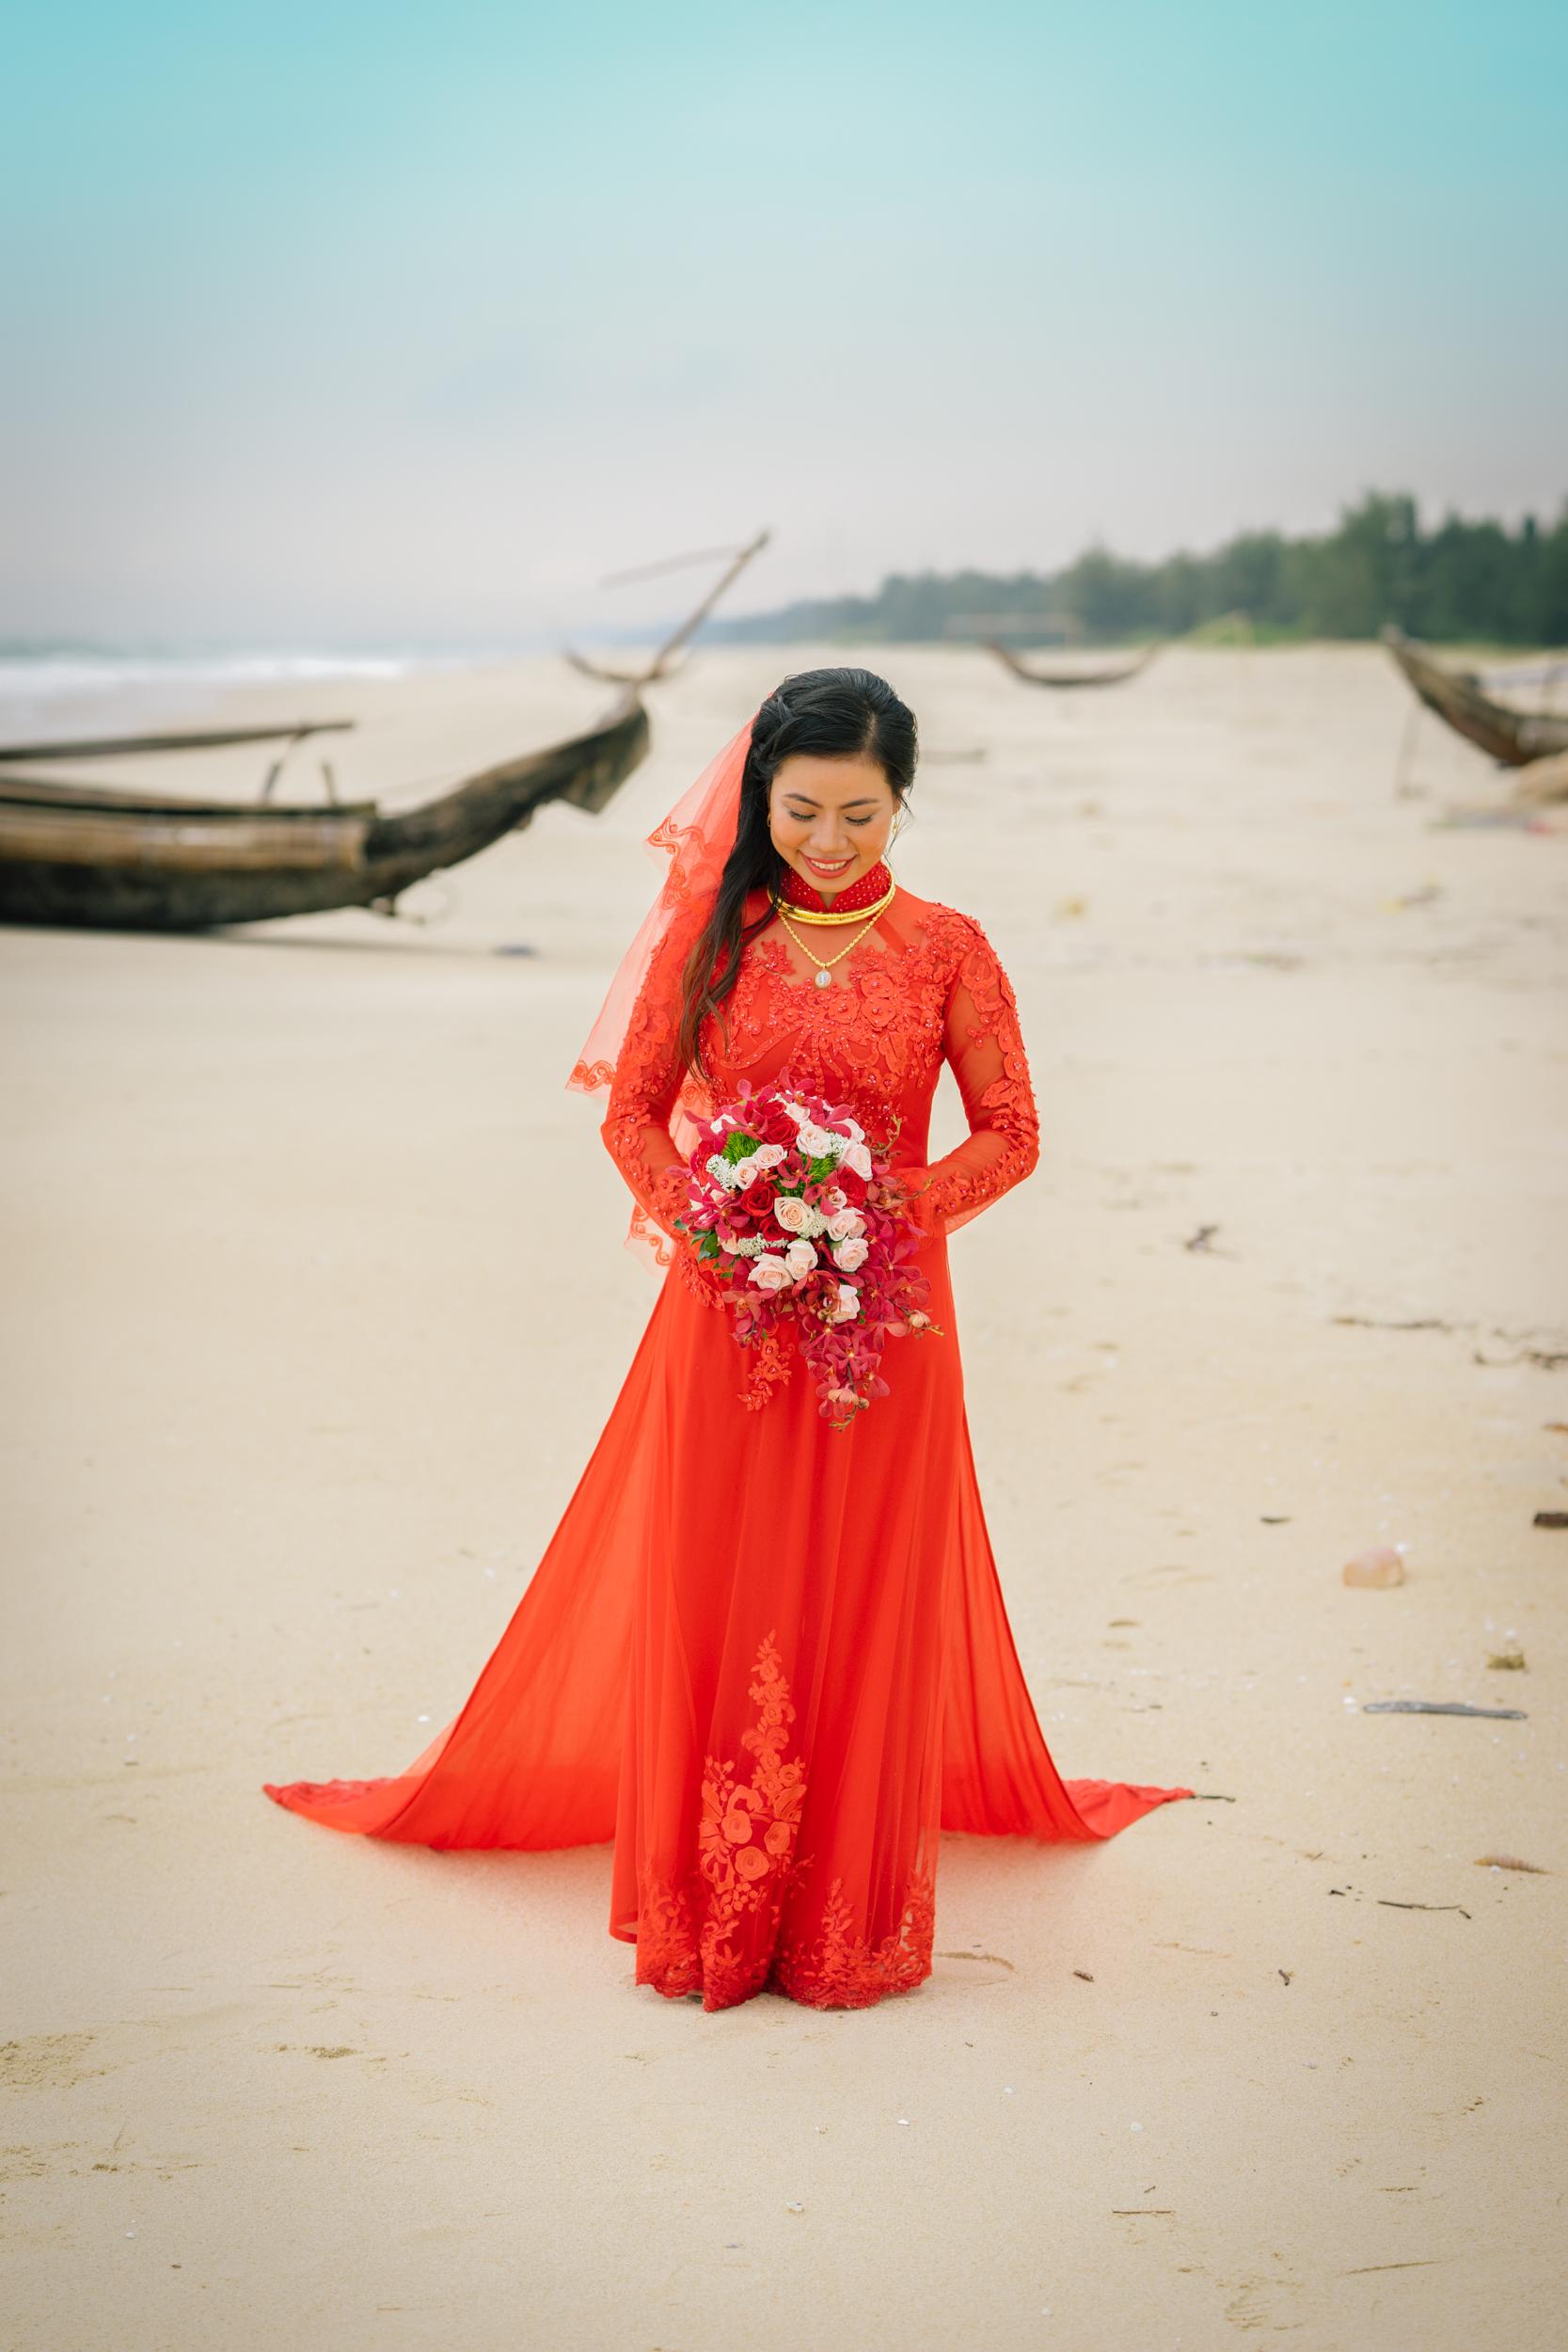 JKP-Destination-Weddings-0103.JPG